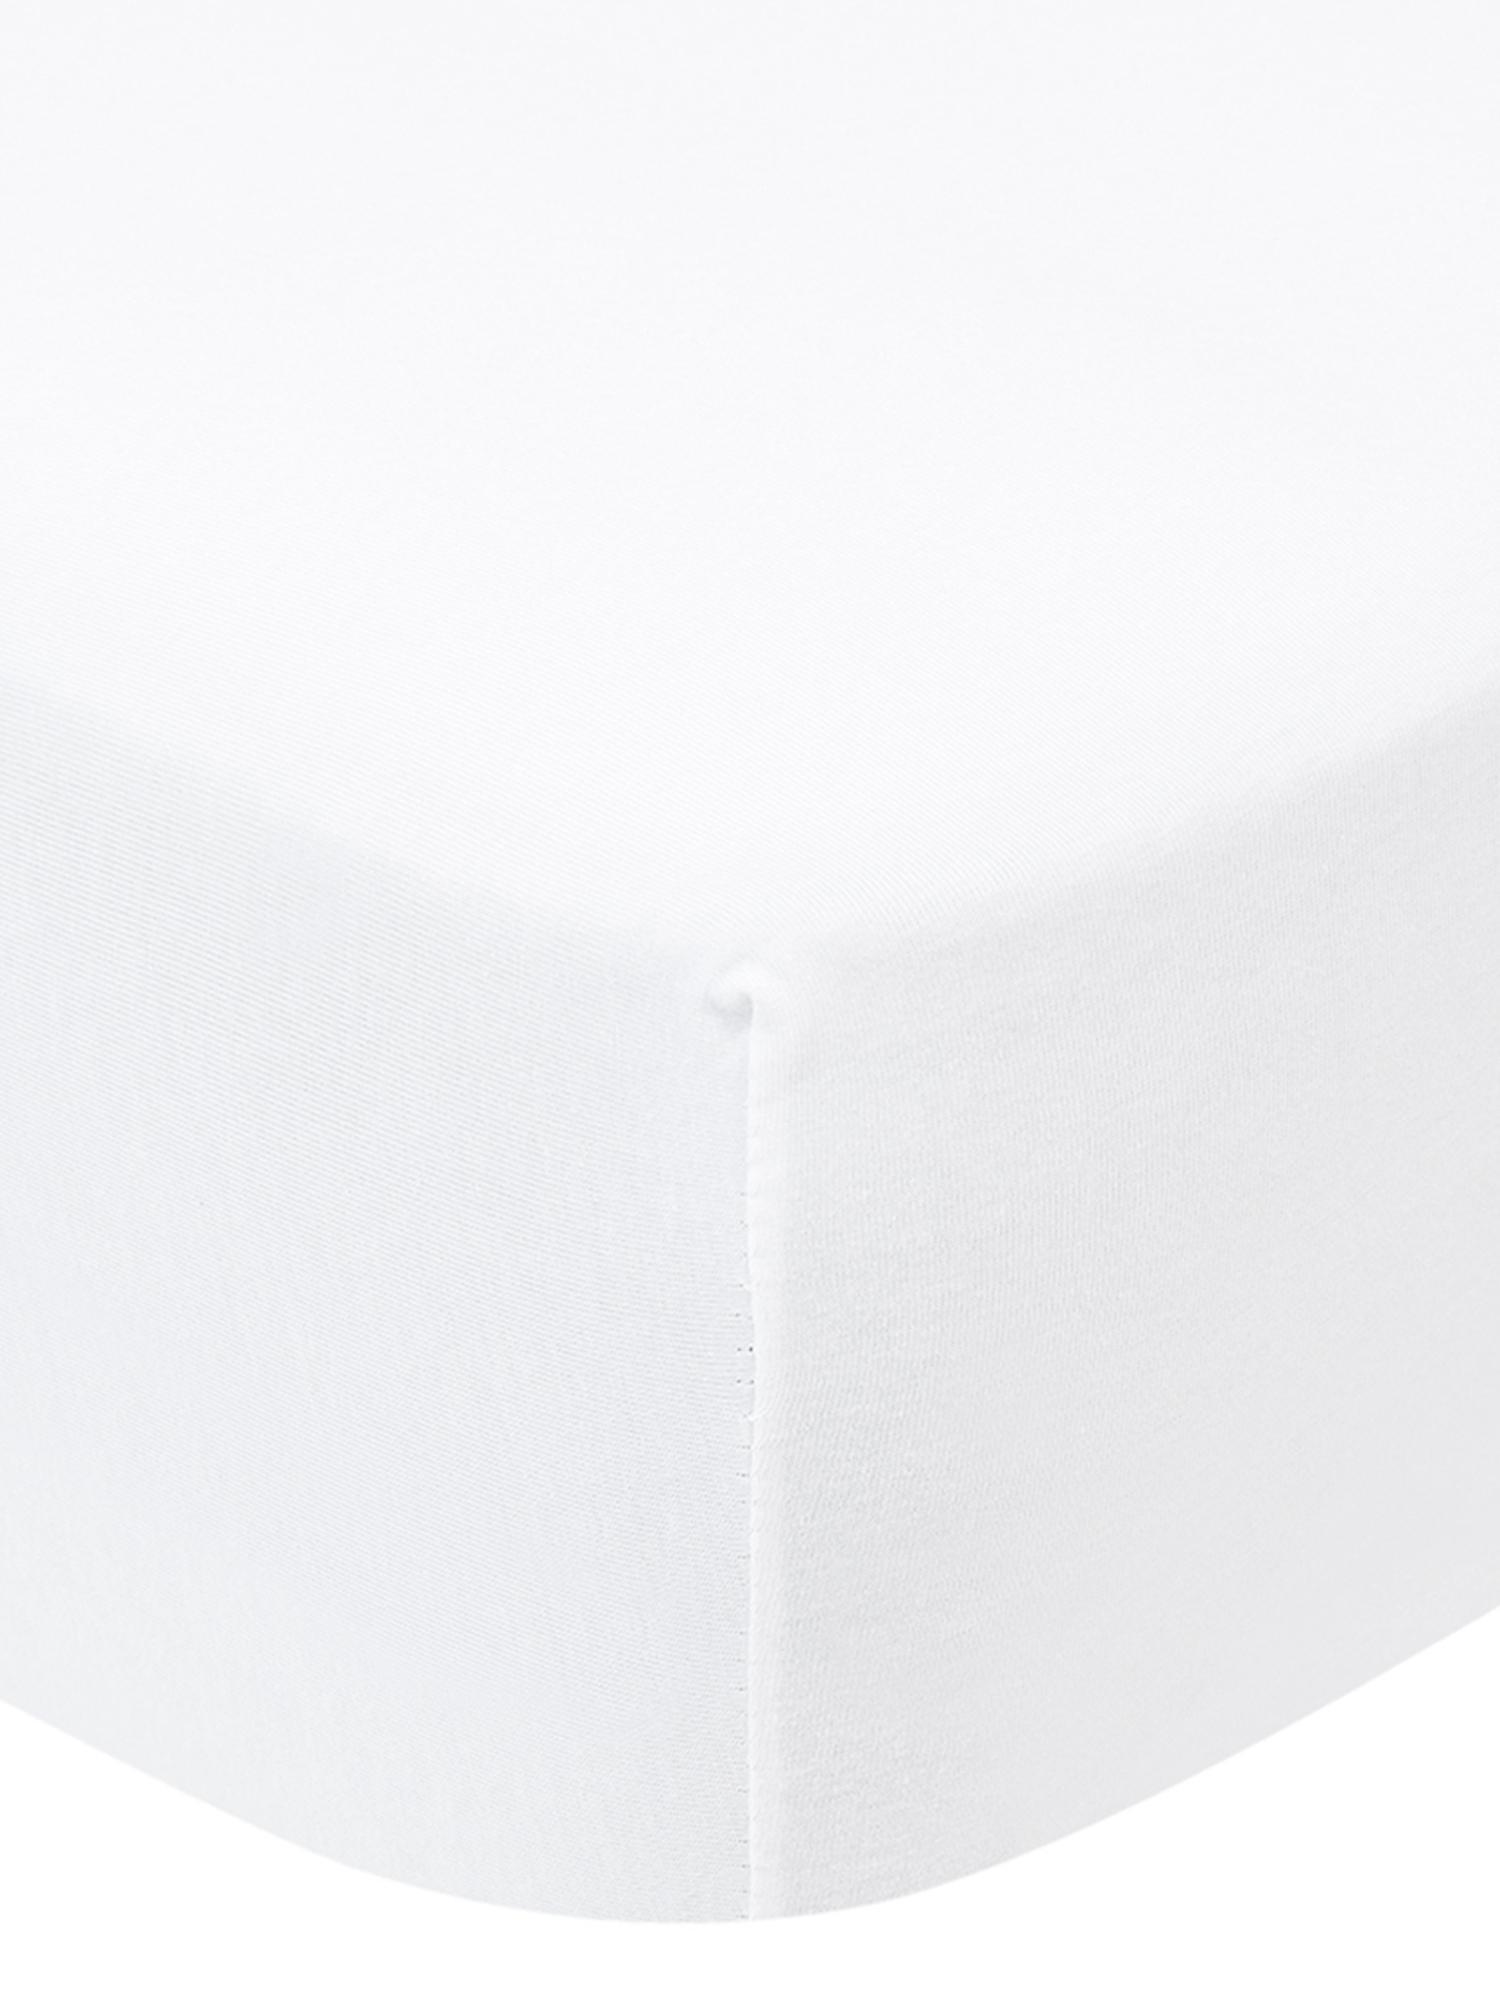 Sábana bajera de jersey con elastano Lara, 95%algodón, 5%elastano, Blanco, Cama 180 cm (180 x 200 cm)